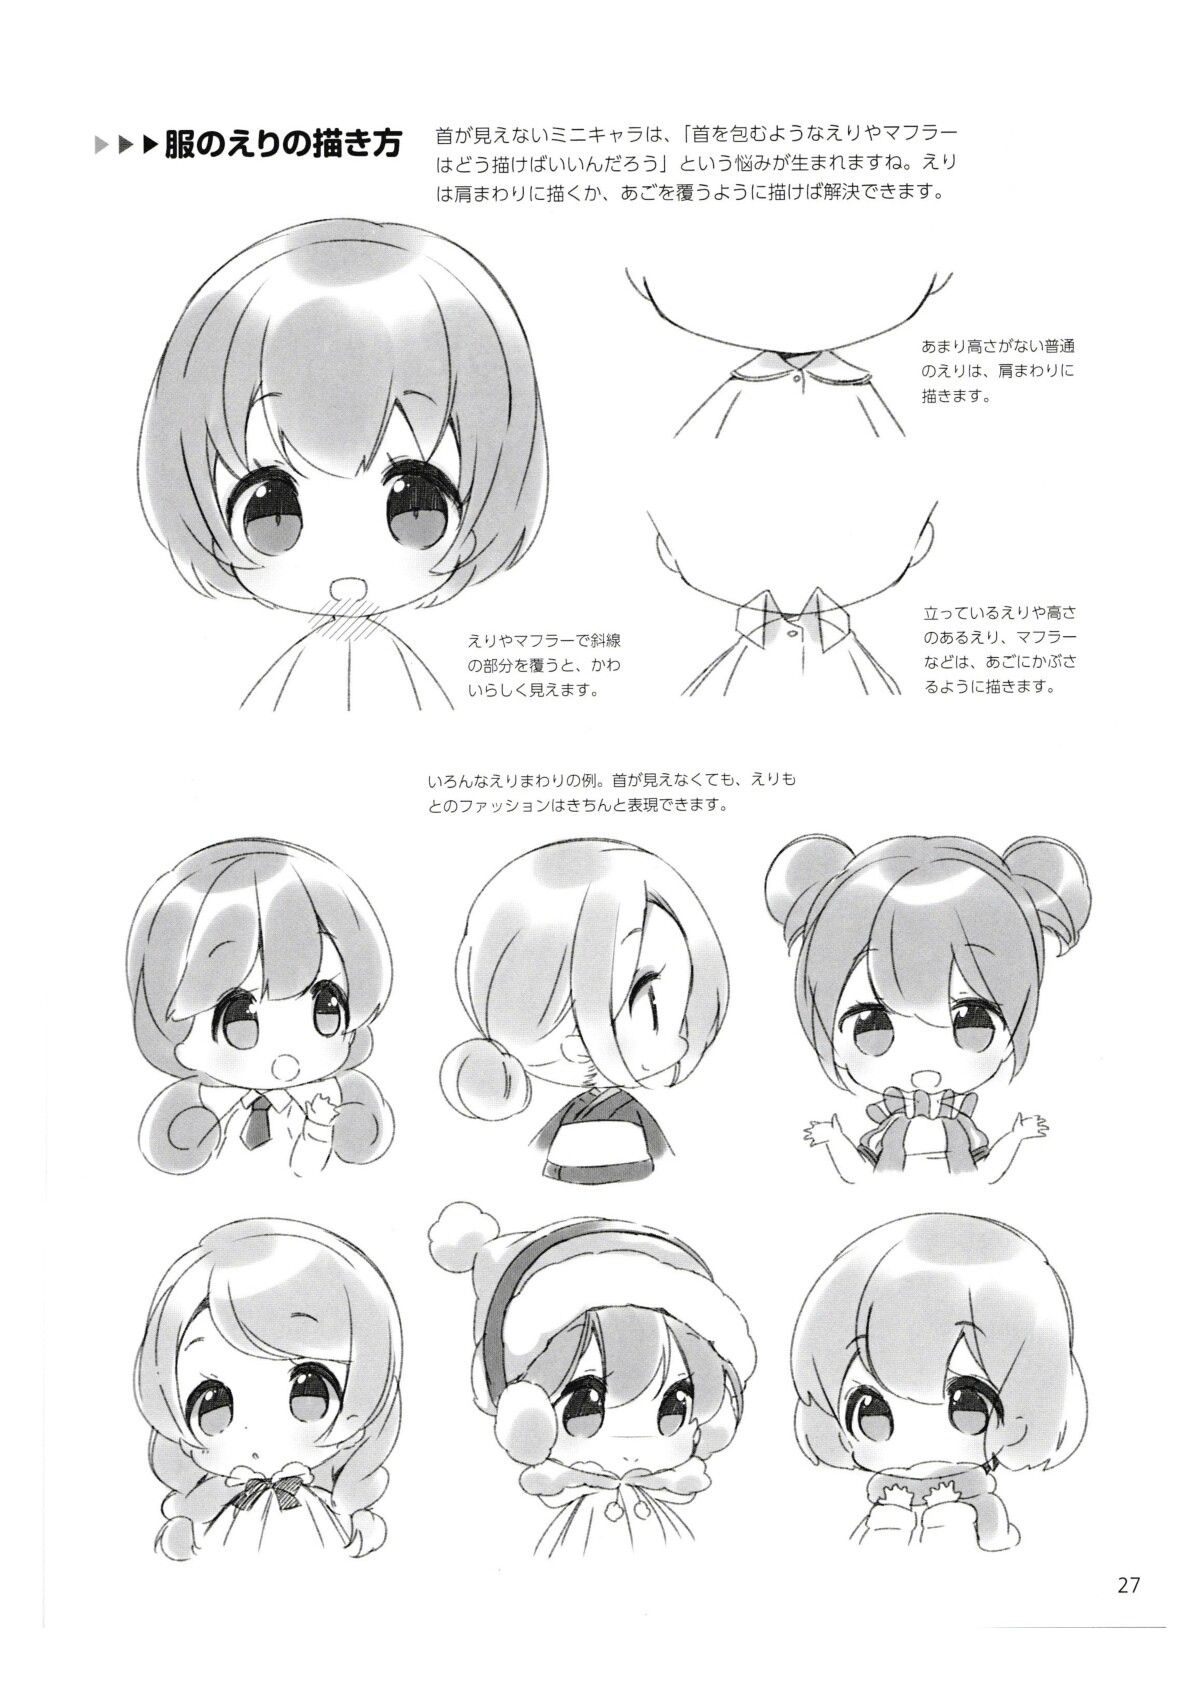 How To Draw Chibis 27 Chibi Drawings Chibi Sketch Anime Drawing Books